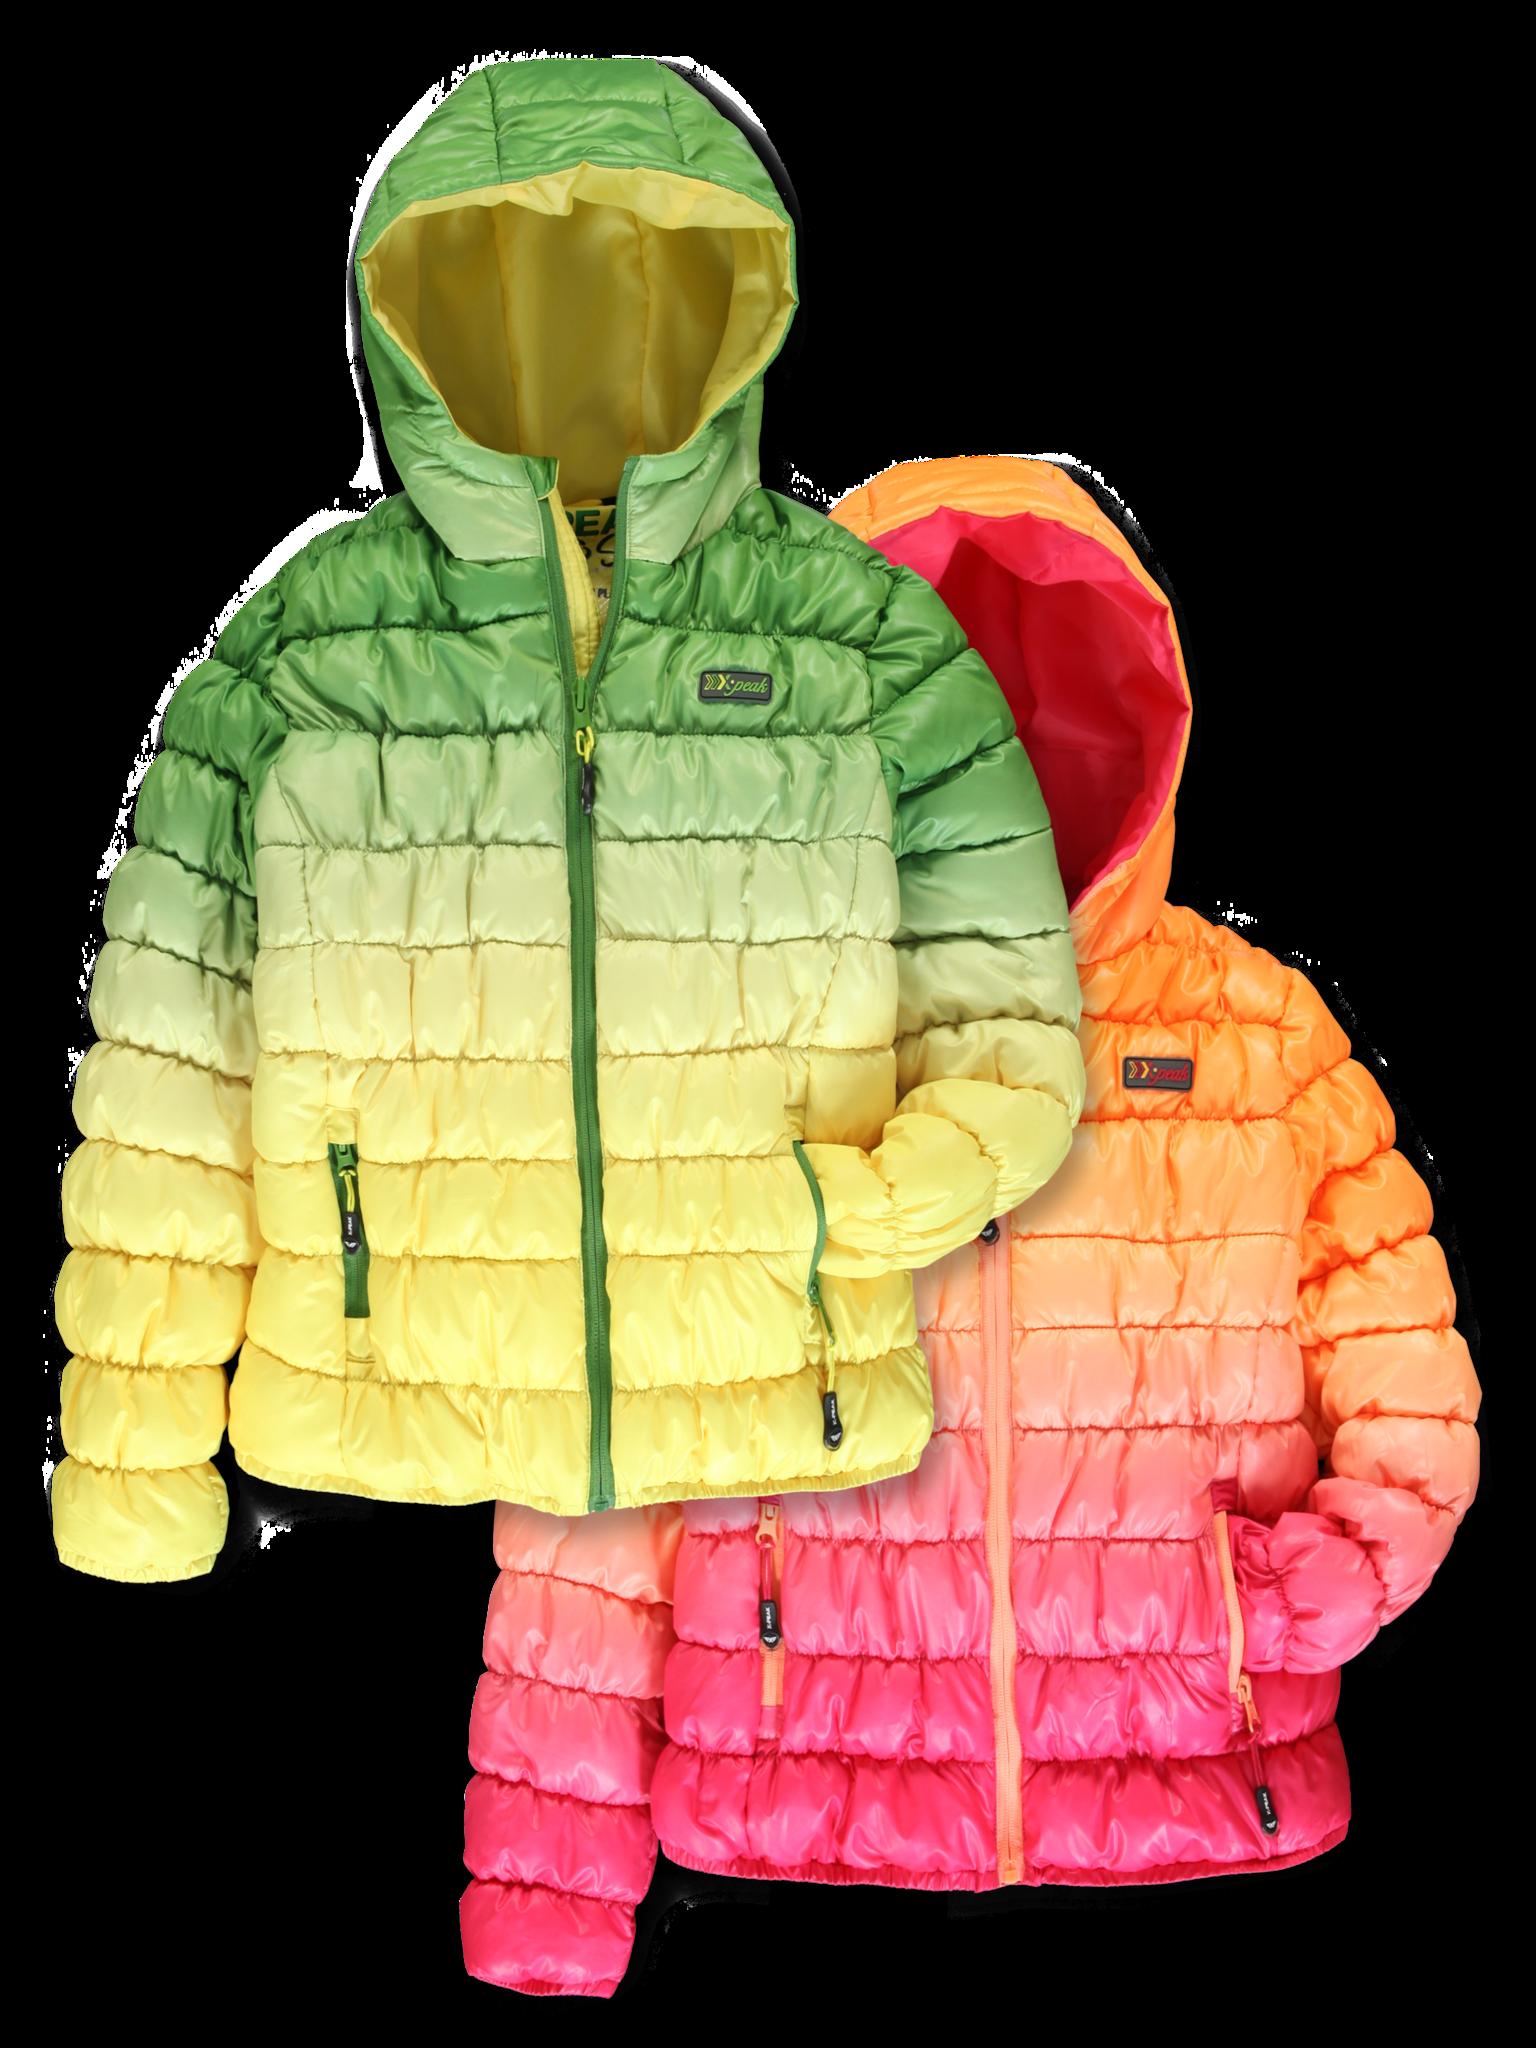 All Brands | Winterproducts Ladies | Jacket | 14 pcs/box